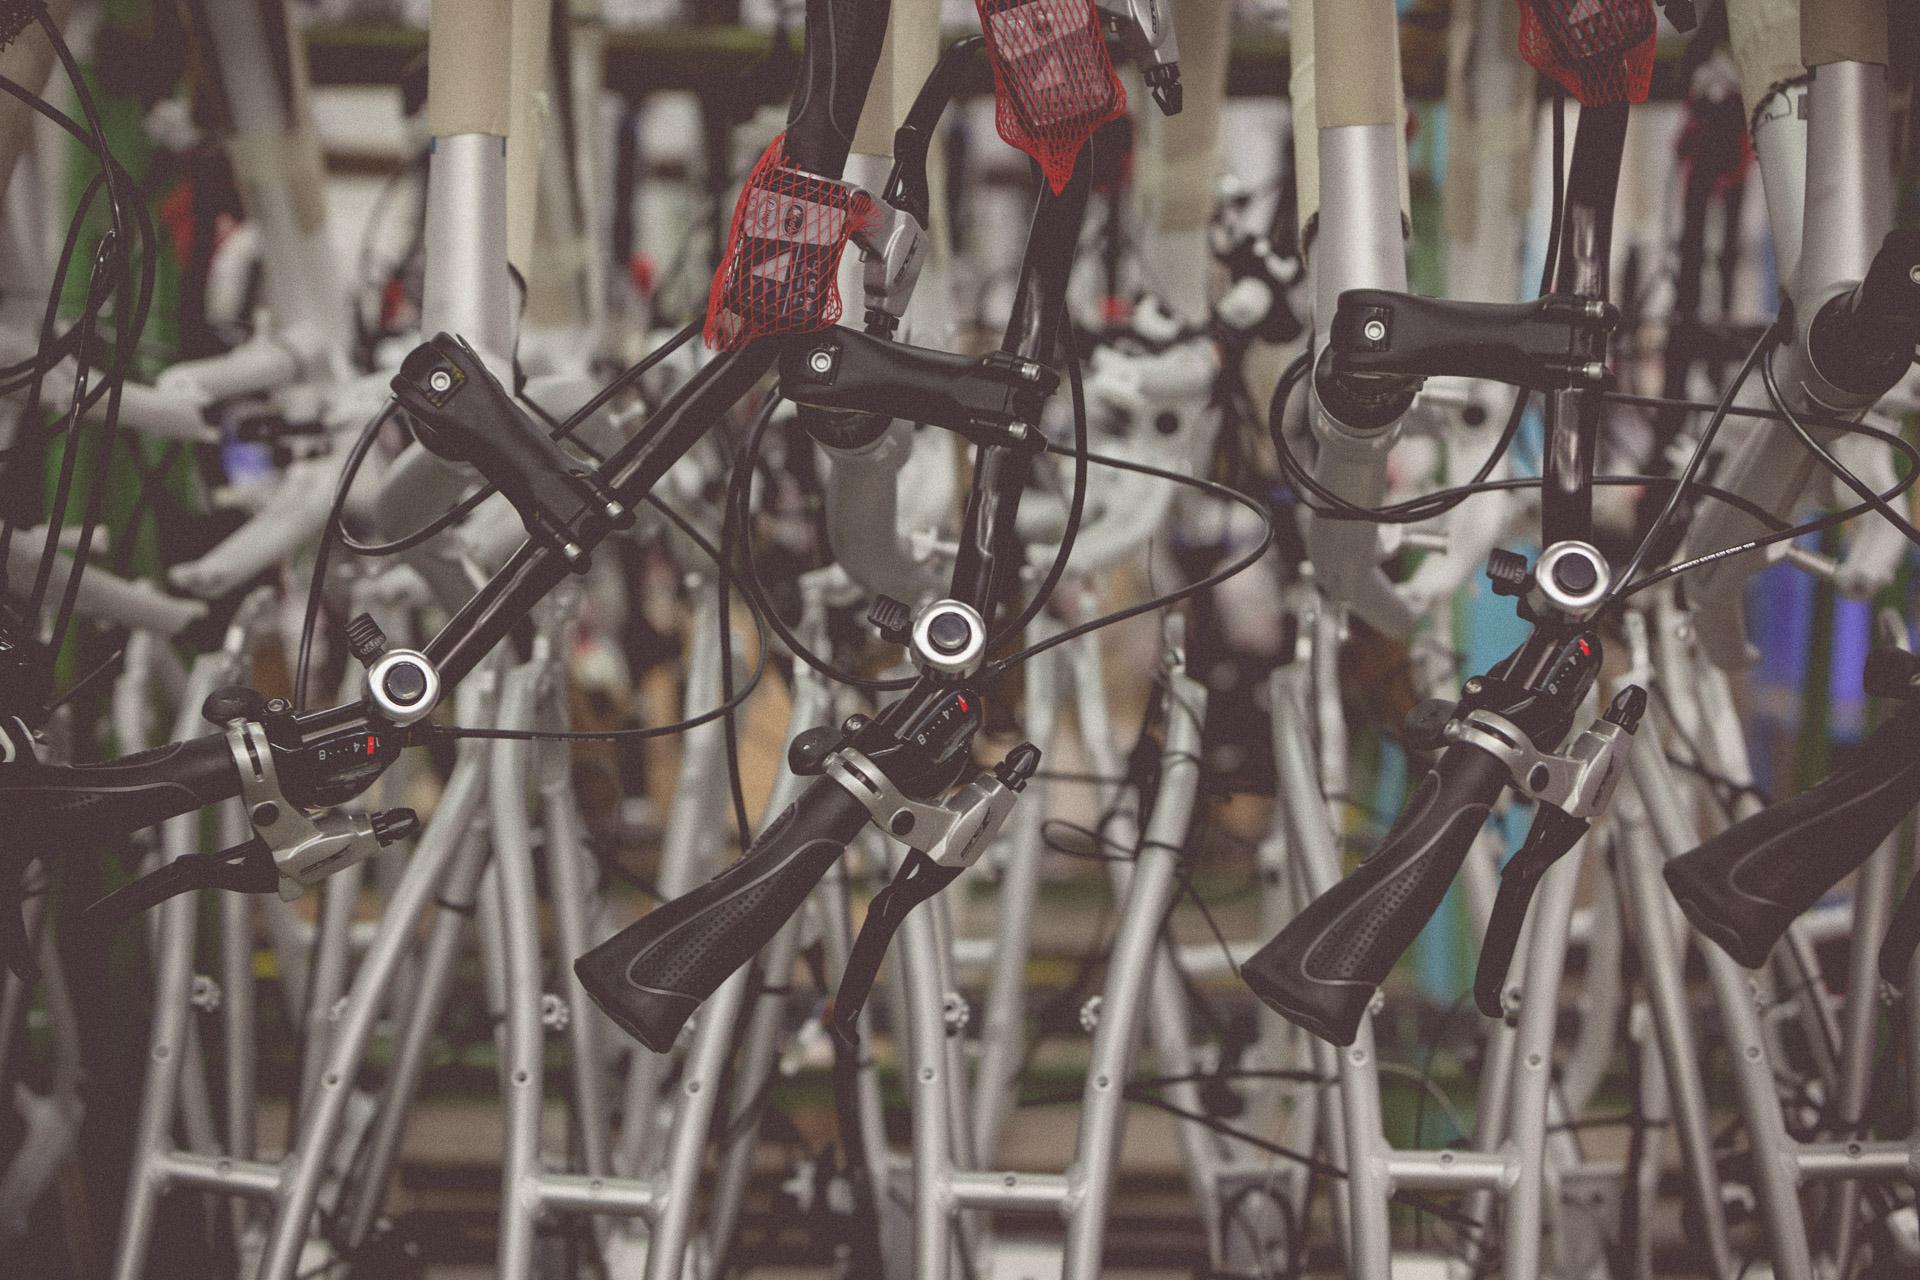 35-Derby-Cycle-Werke-Fahrradproduktion